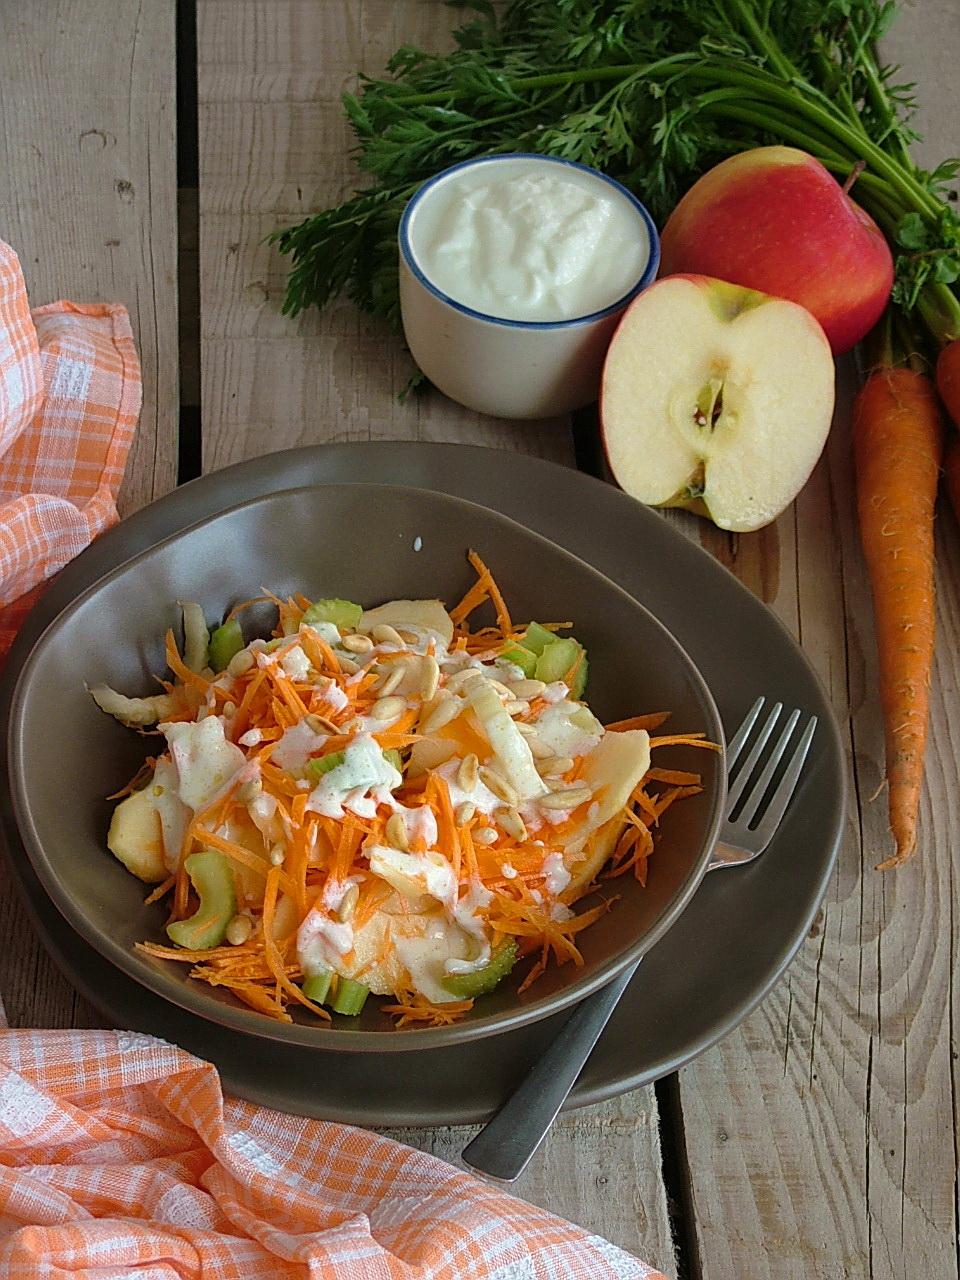 insalata con carote, sedano, mela e pinoli condita con yogurt